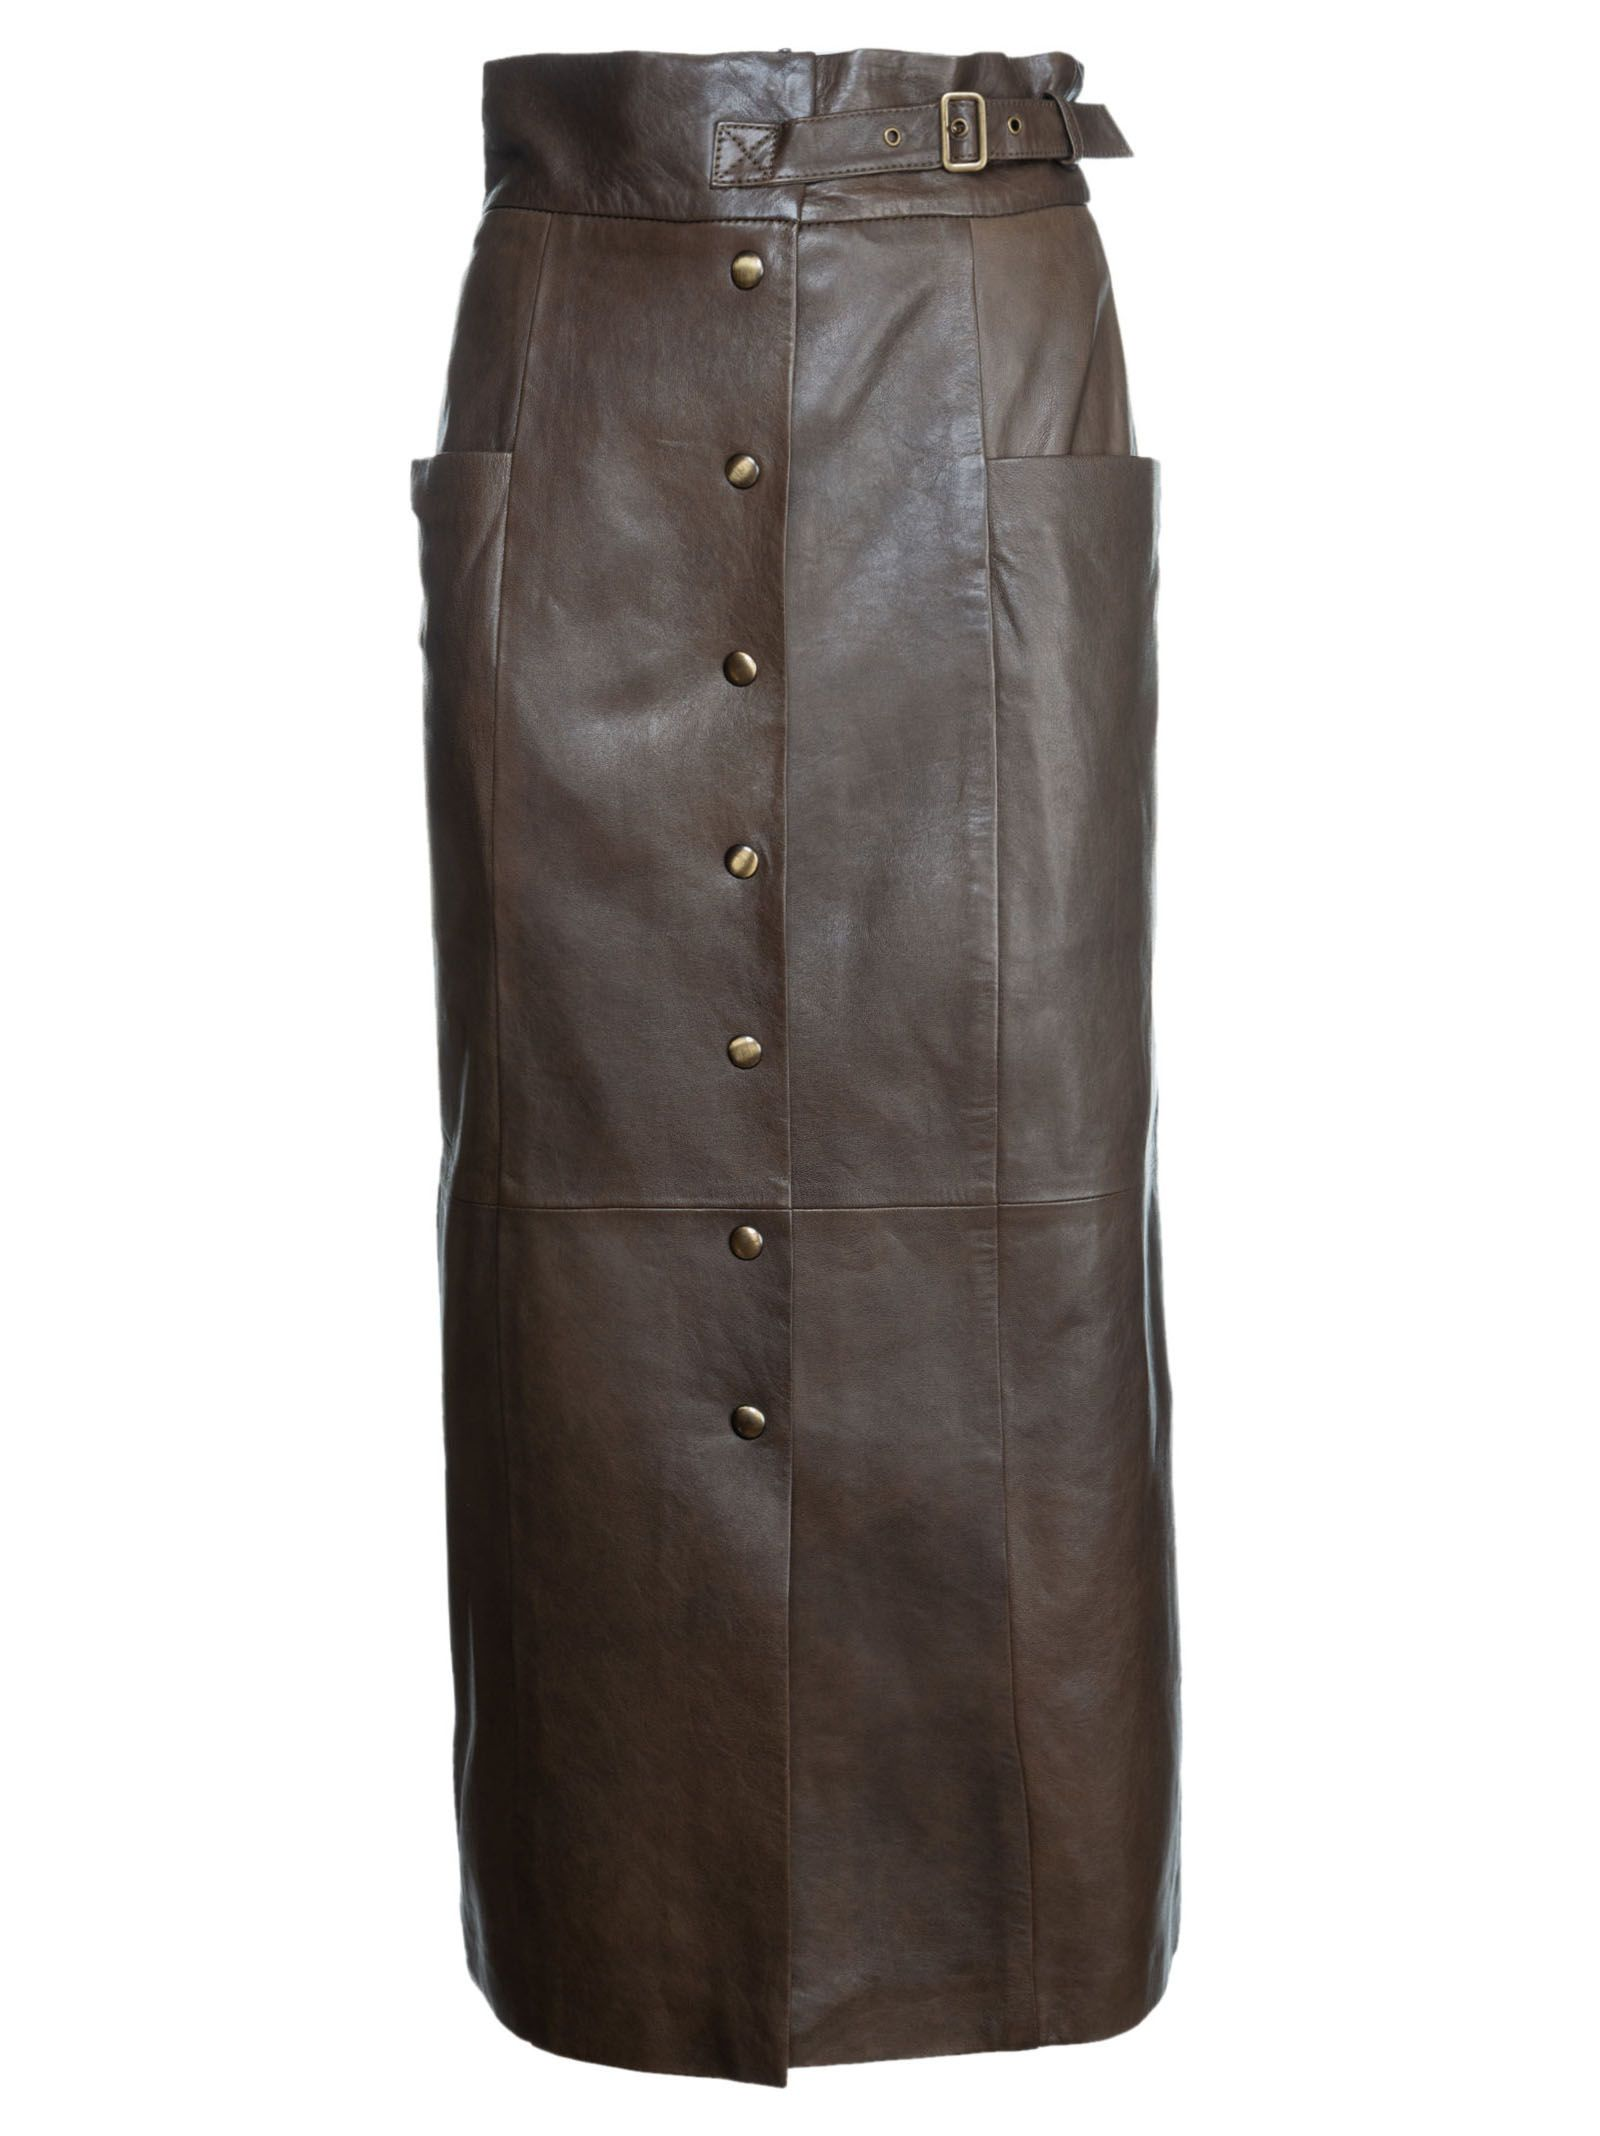 Alberta Ferretti Buttoned Skirt